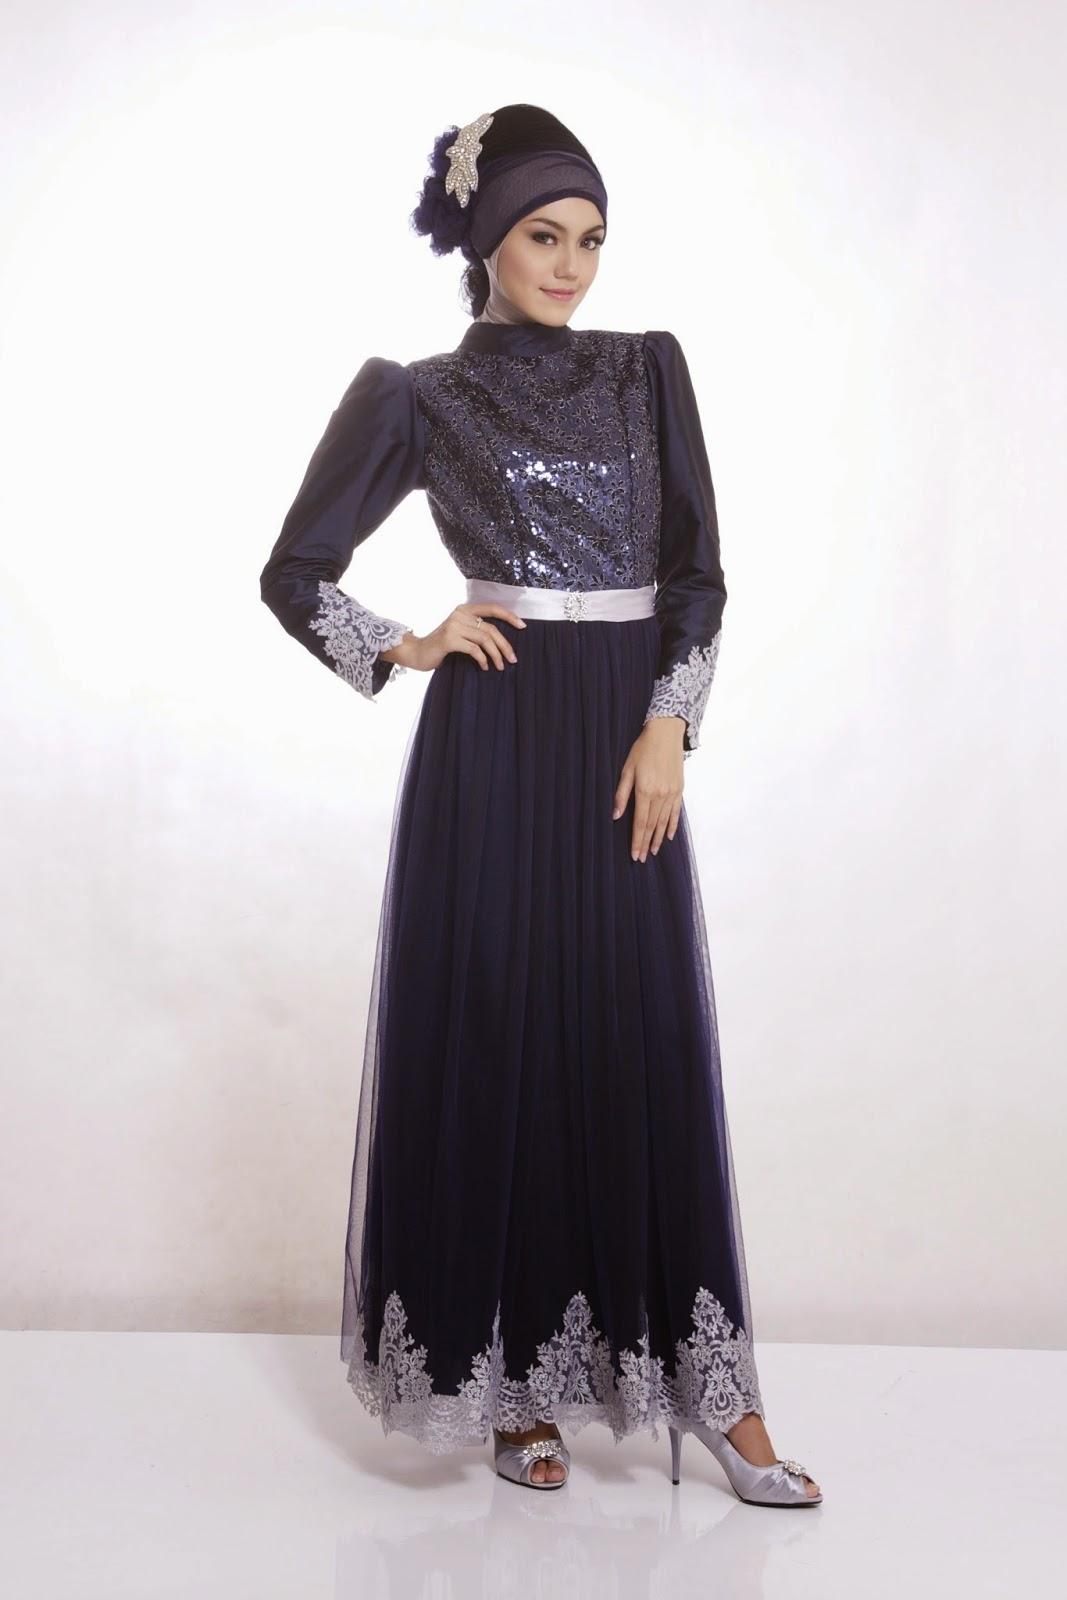 Contoh Gaun Pesta Muslim Wanita Acara Pesta